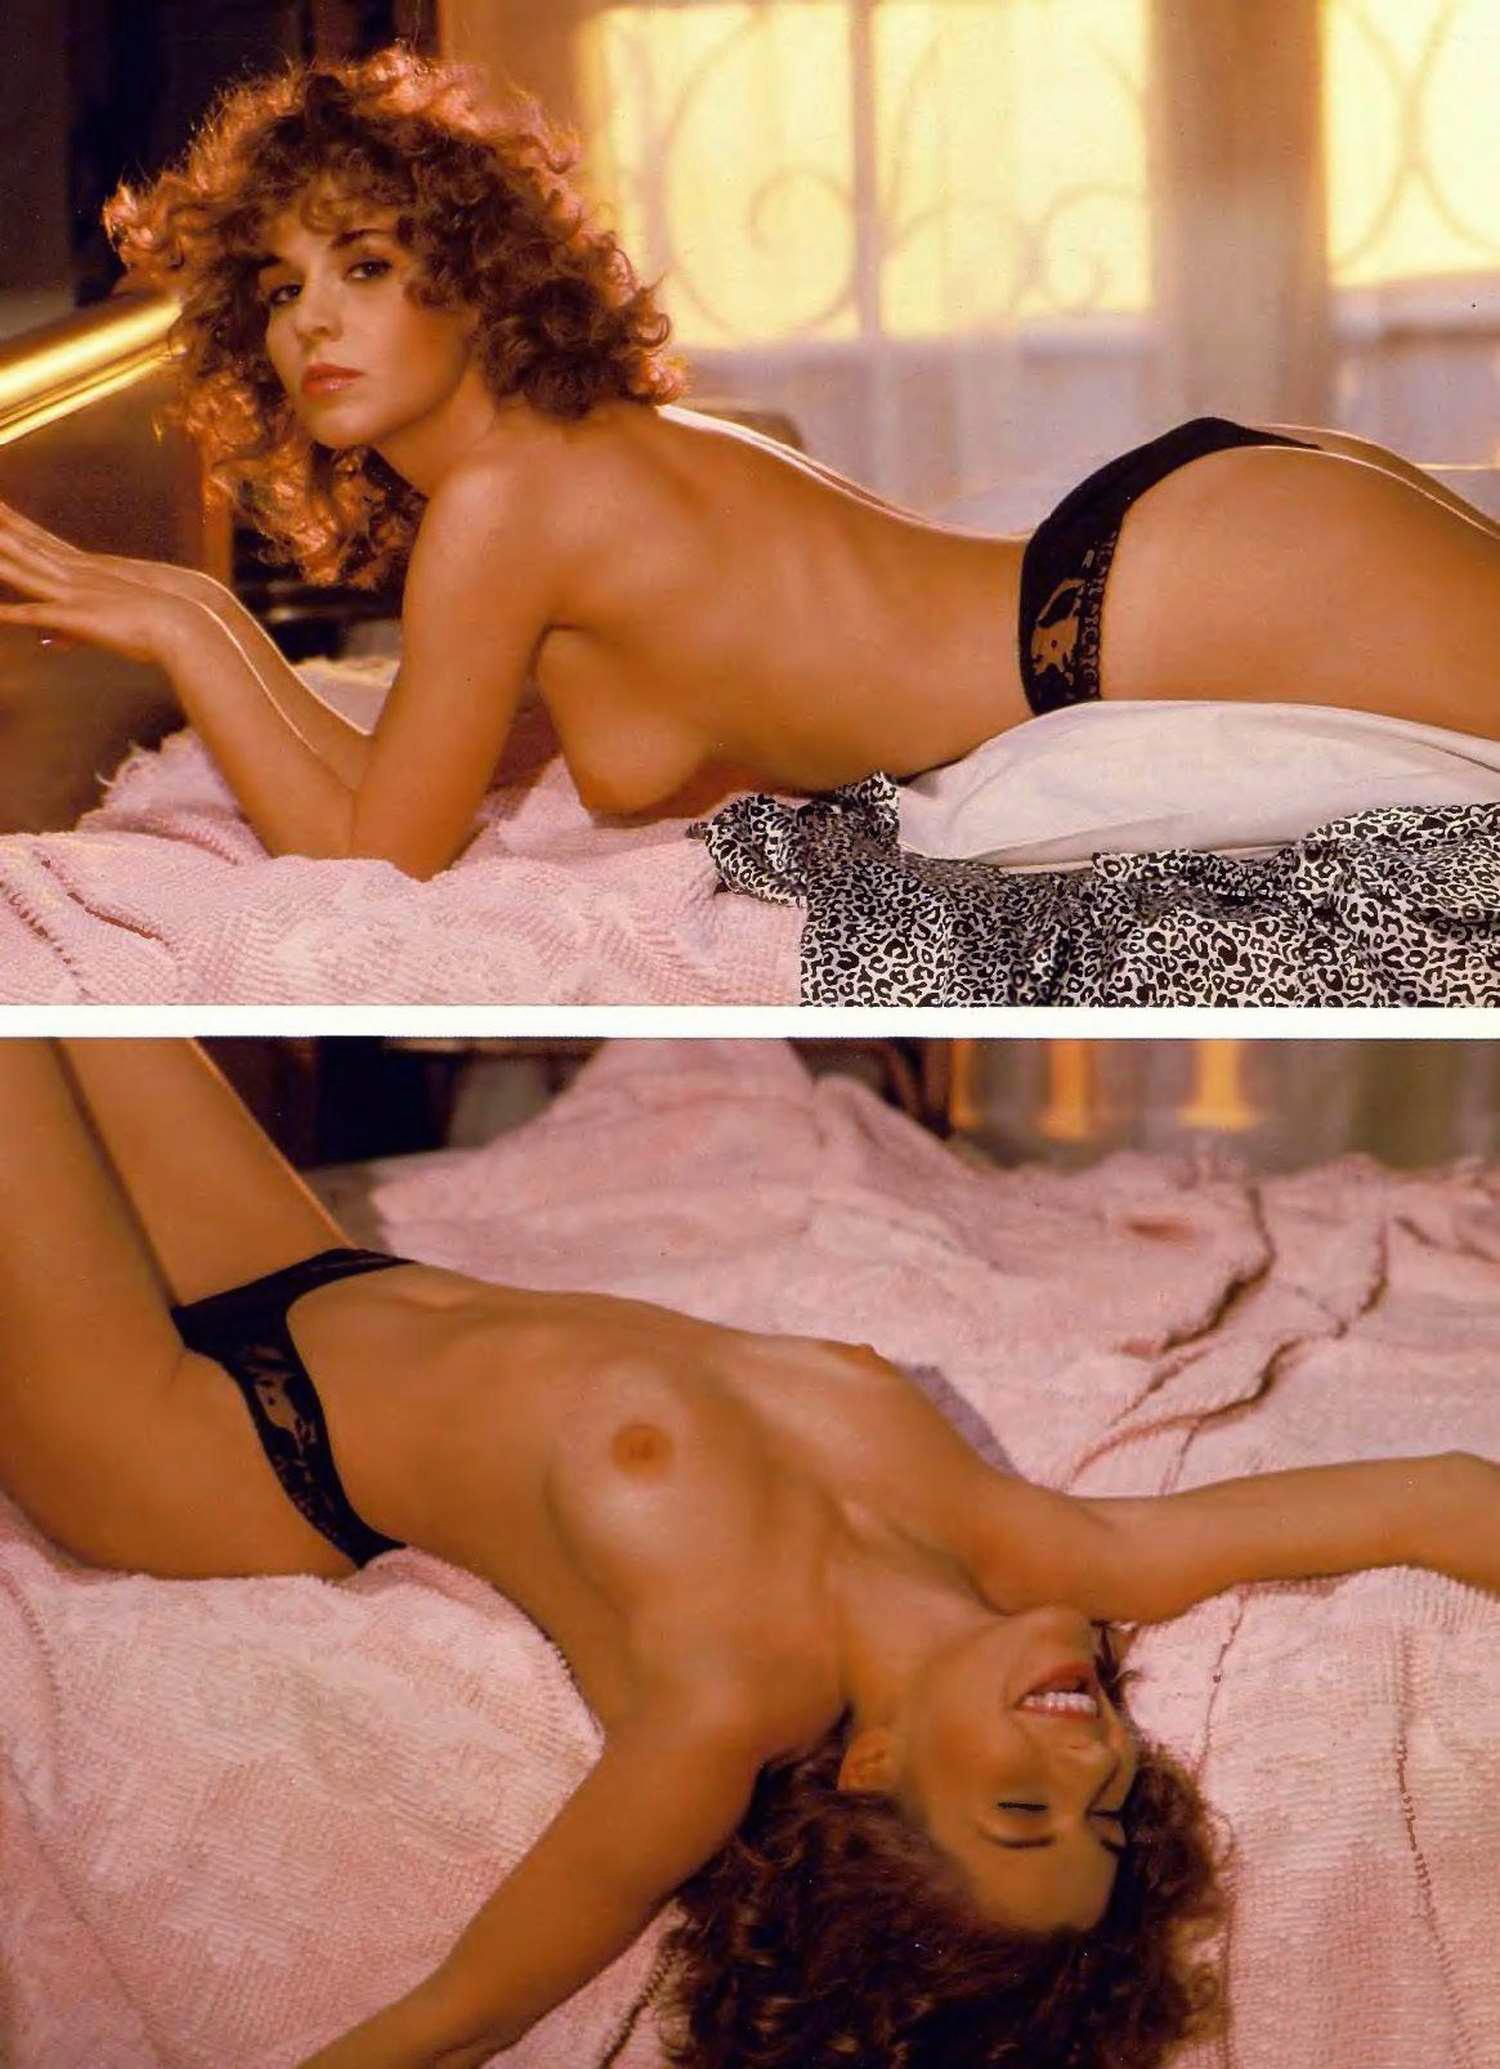 Наталья негода порно